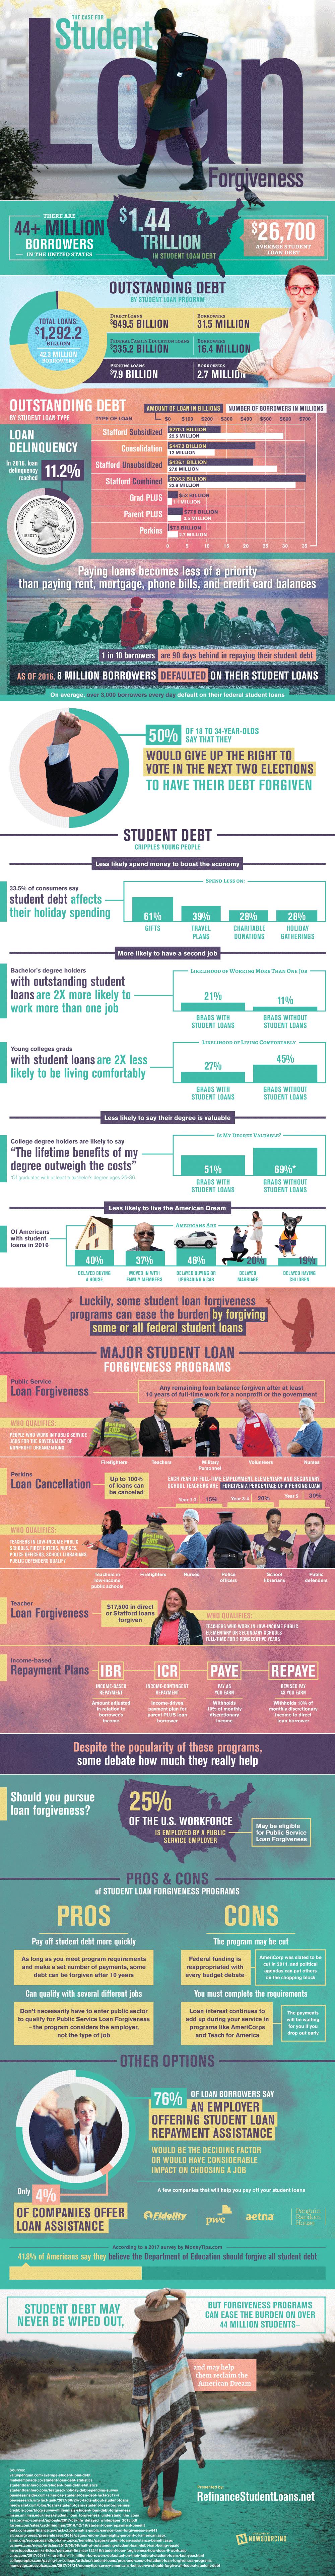 student_loan_forgiveness_infog